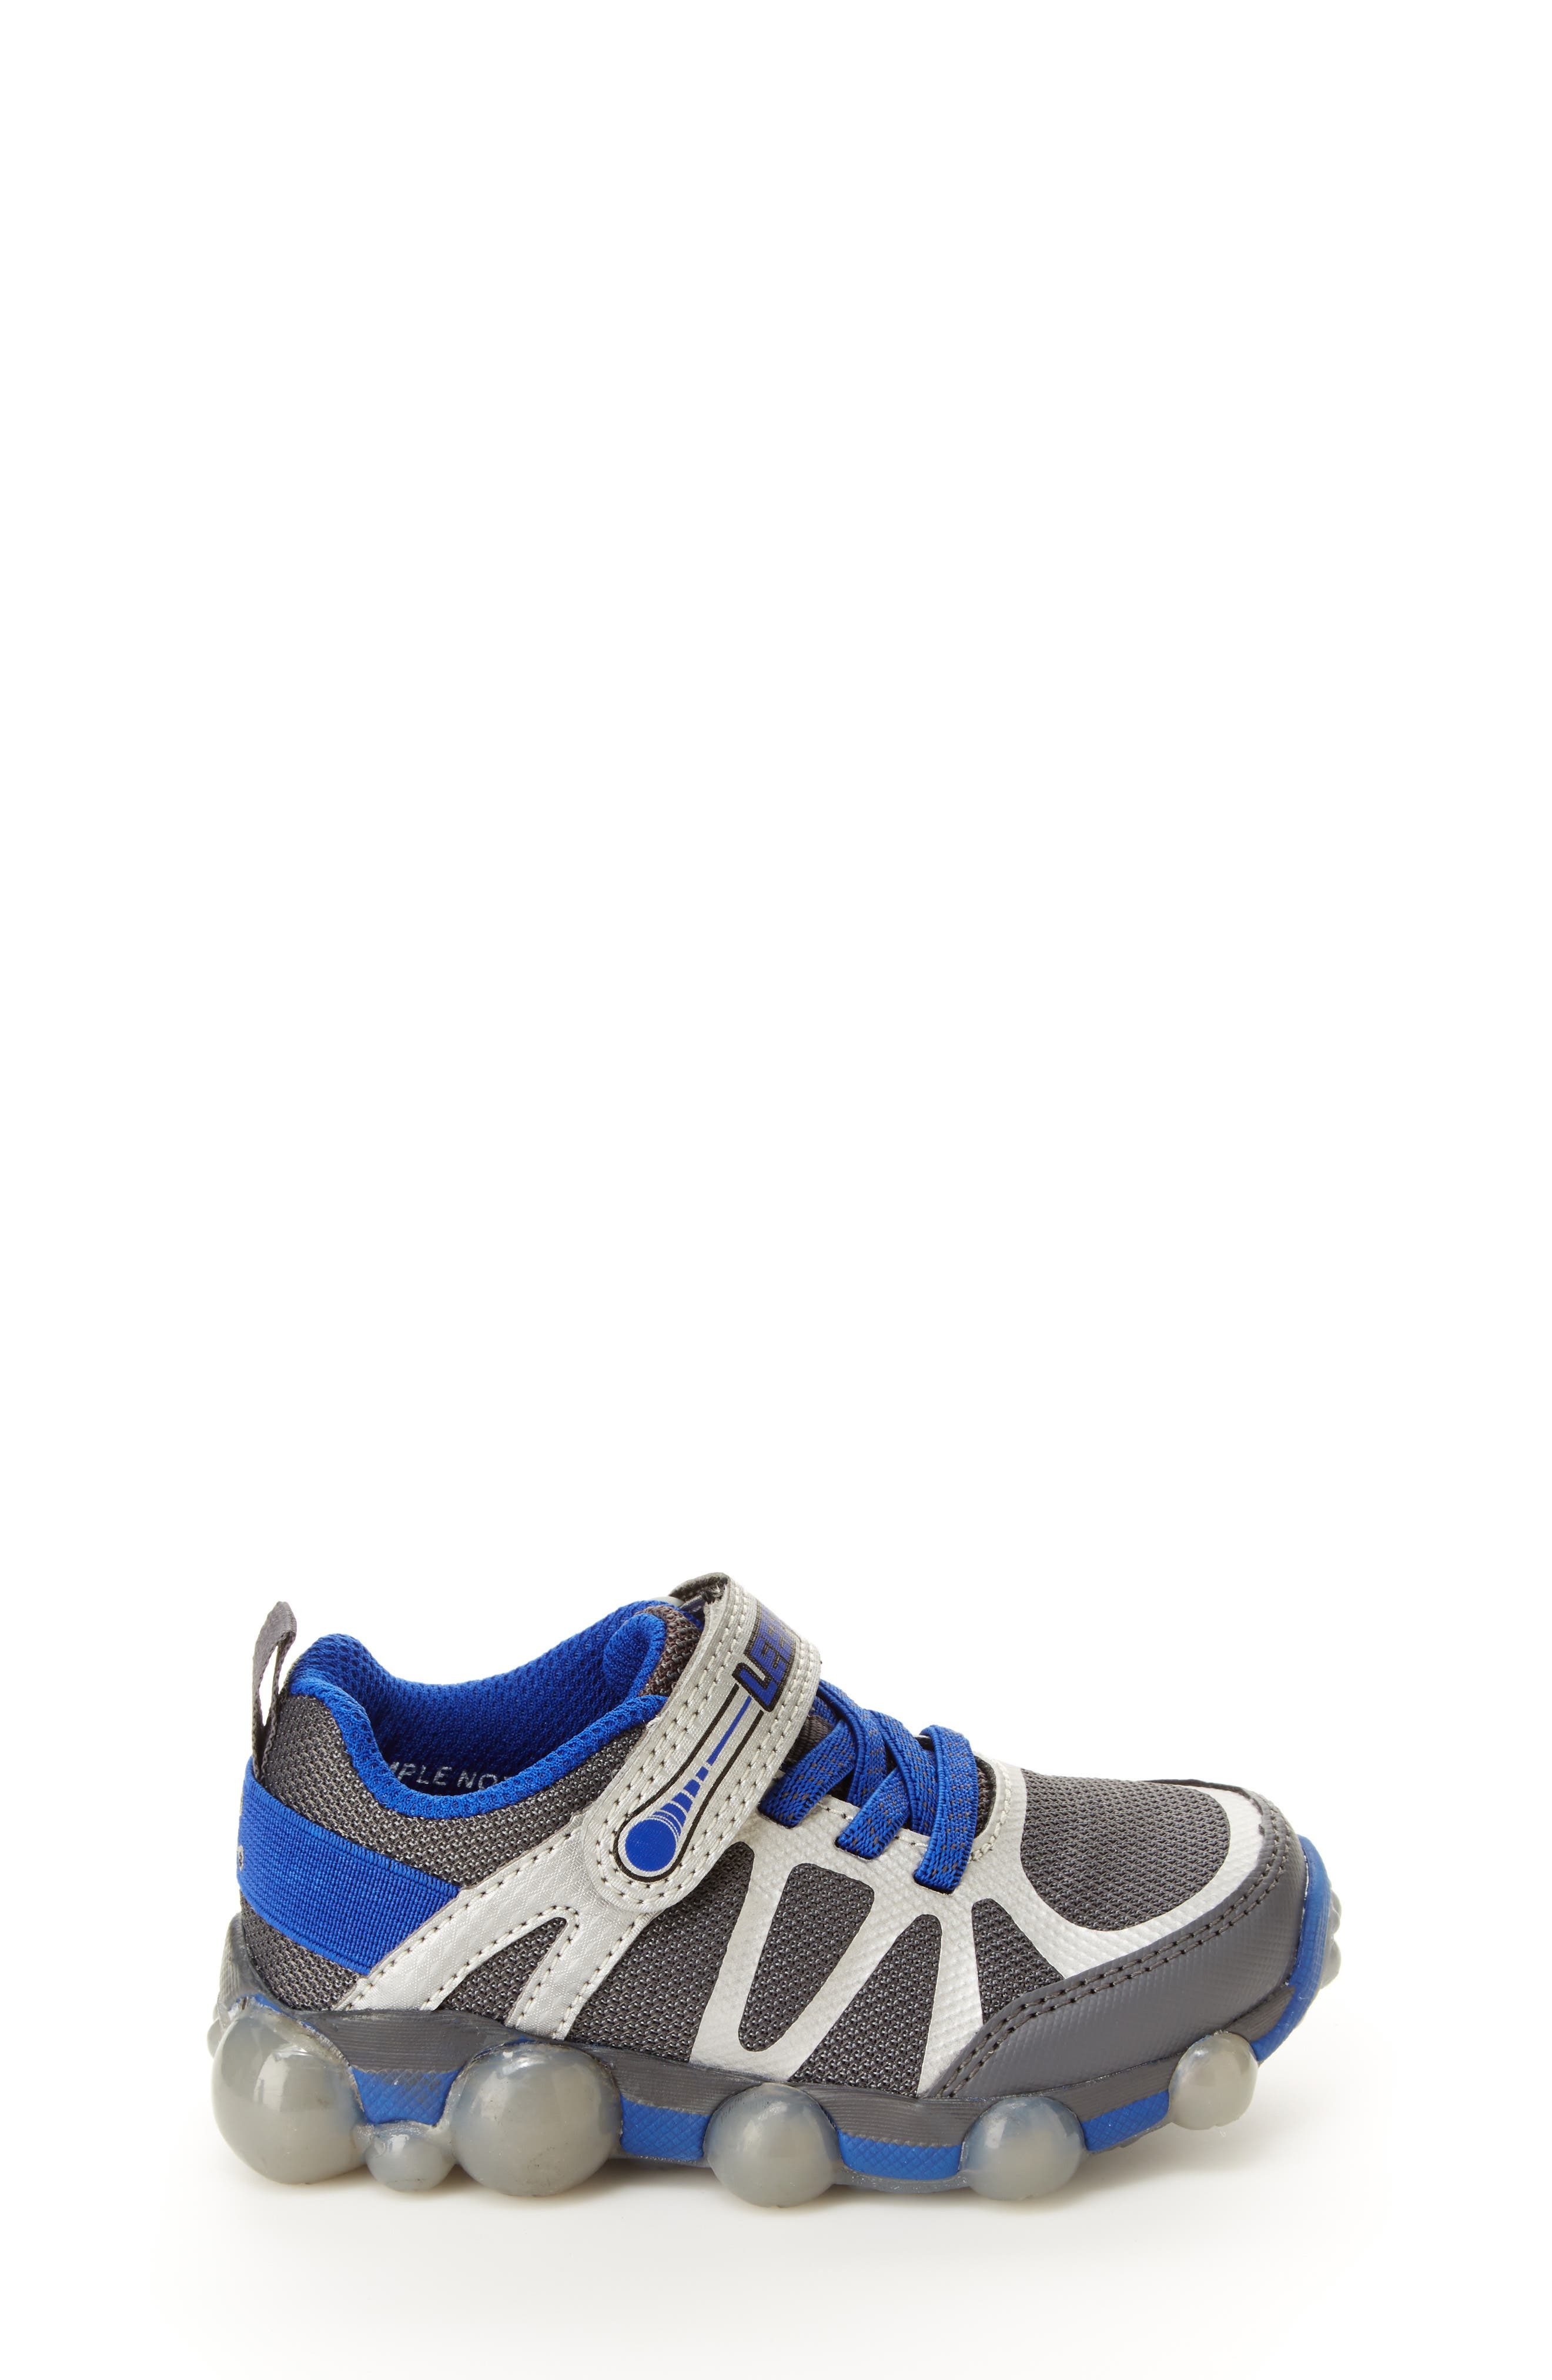 Leepz 3.0 Light-Up Sneaker,                             Alternate thumbnail 2, color,                             DARK GREY/ BLUE